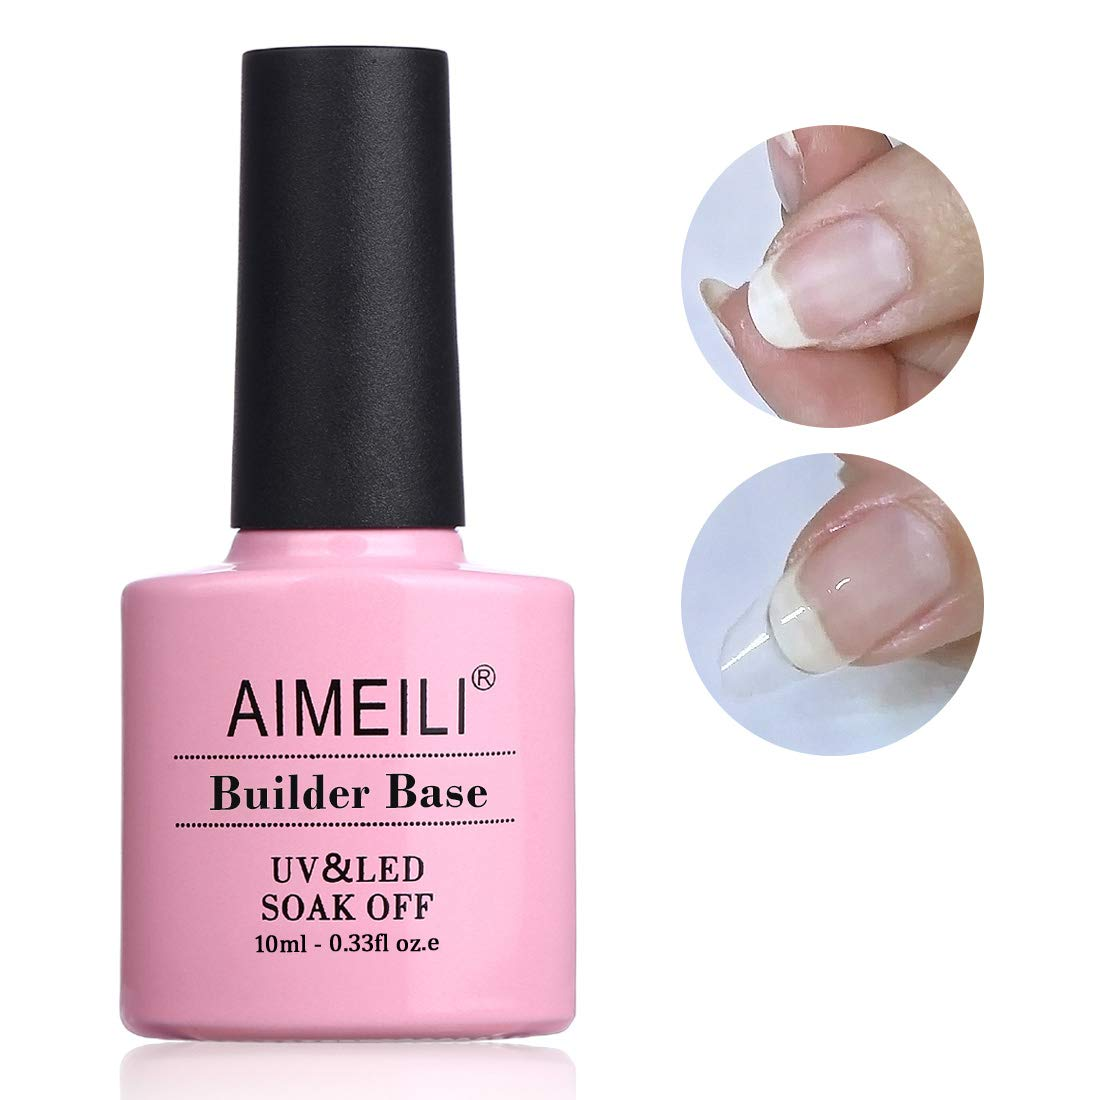 AIMEILI Builder Base Gel Quick Extension Nail Enhancement Reinforce Lacquer Soak Off UV LED Gel Nail Polish : Beauty